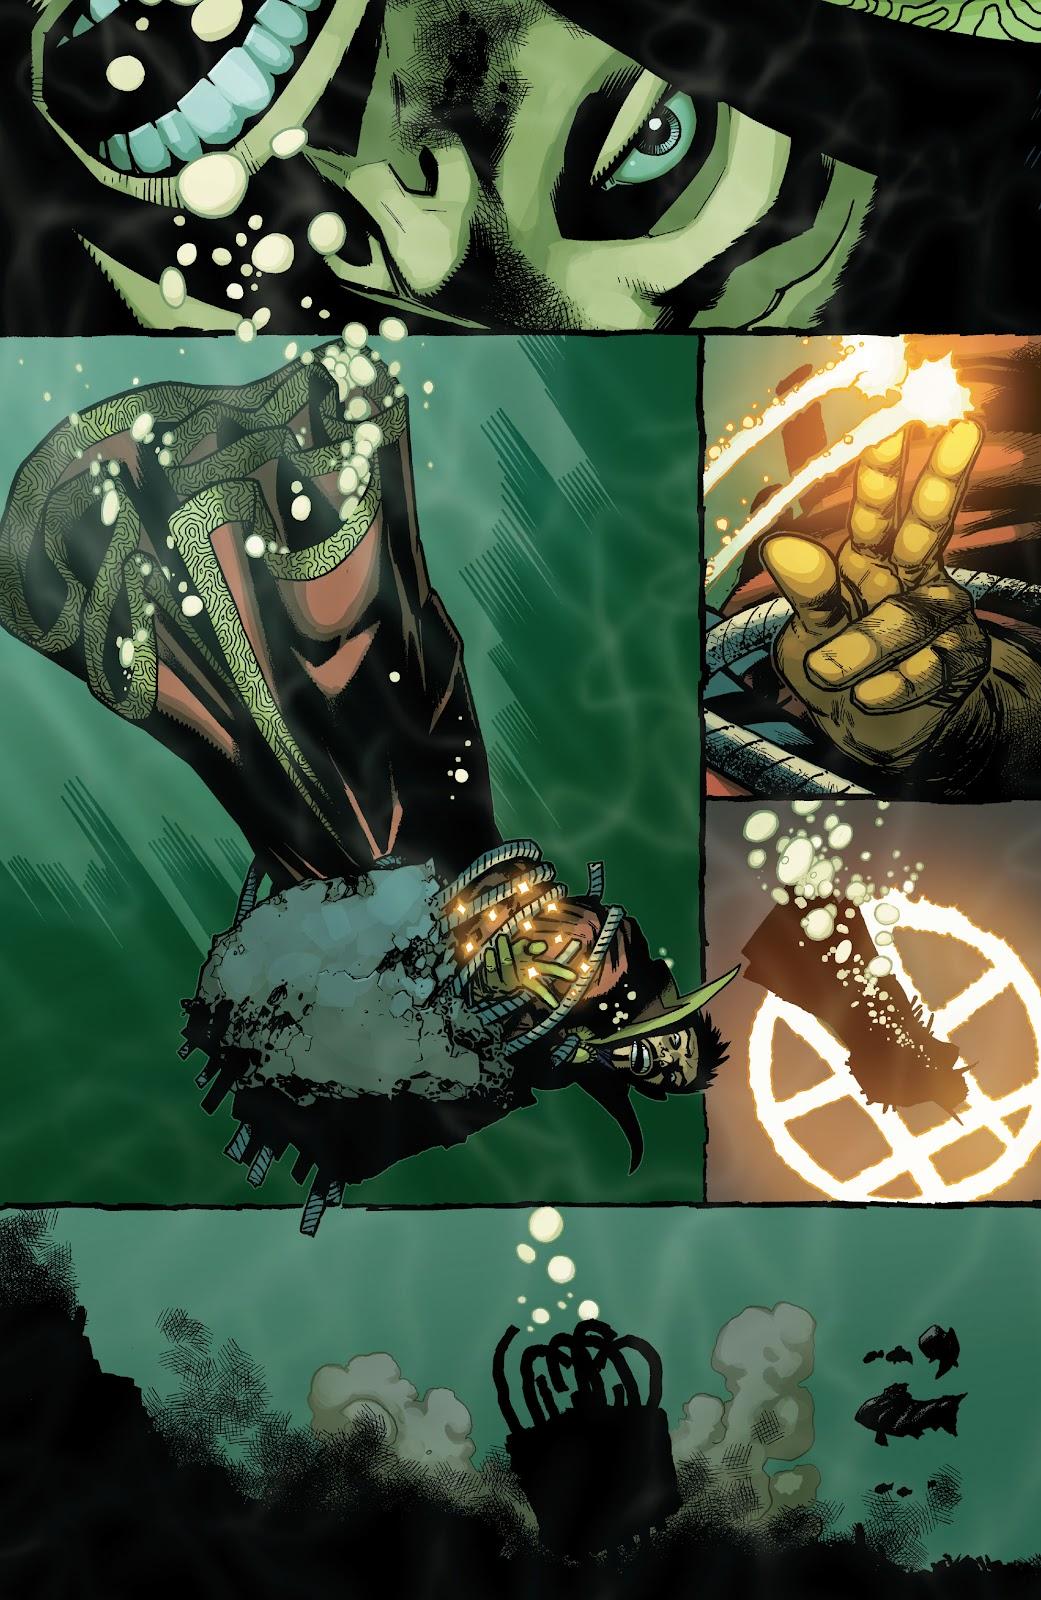 Read online Dr. Strange comic -  Issue #2 - 3